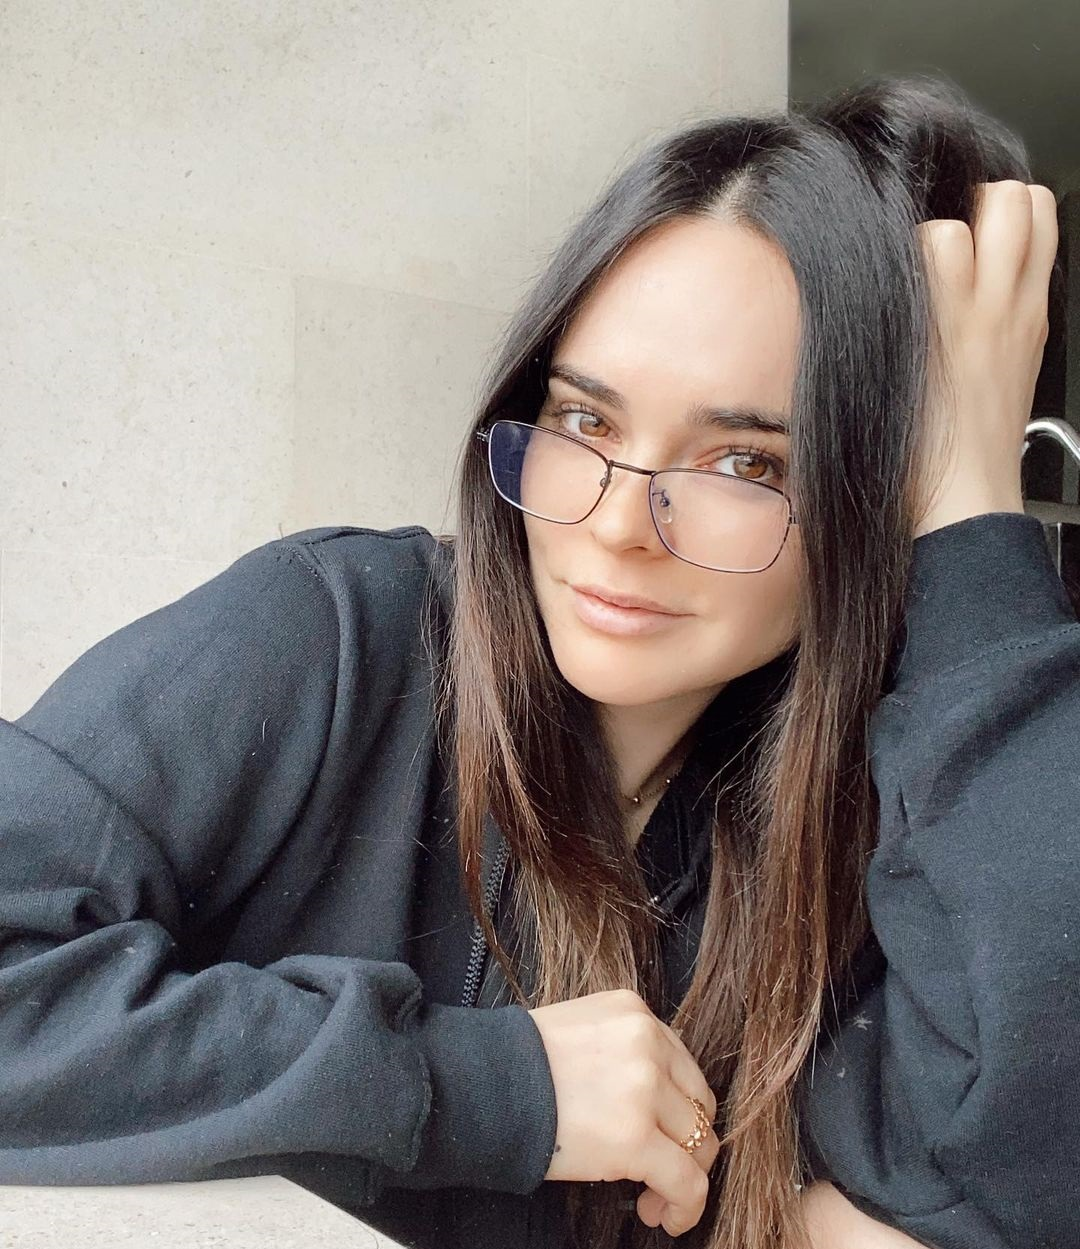 Fabiola-Guajardo-Wallpapers-Insta-Fit-Bio-11